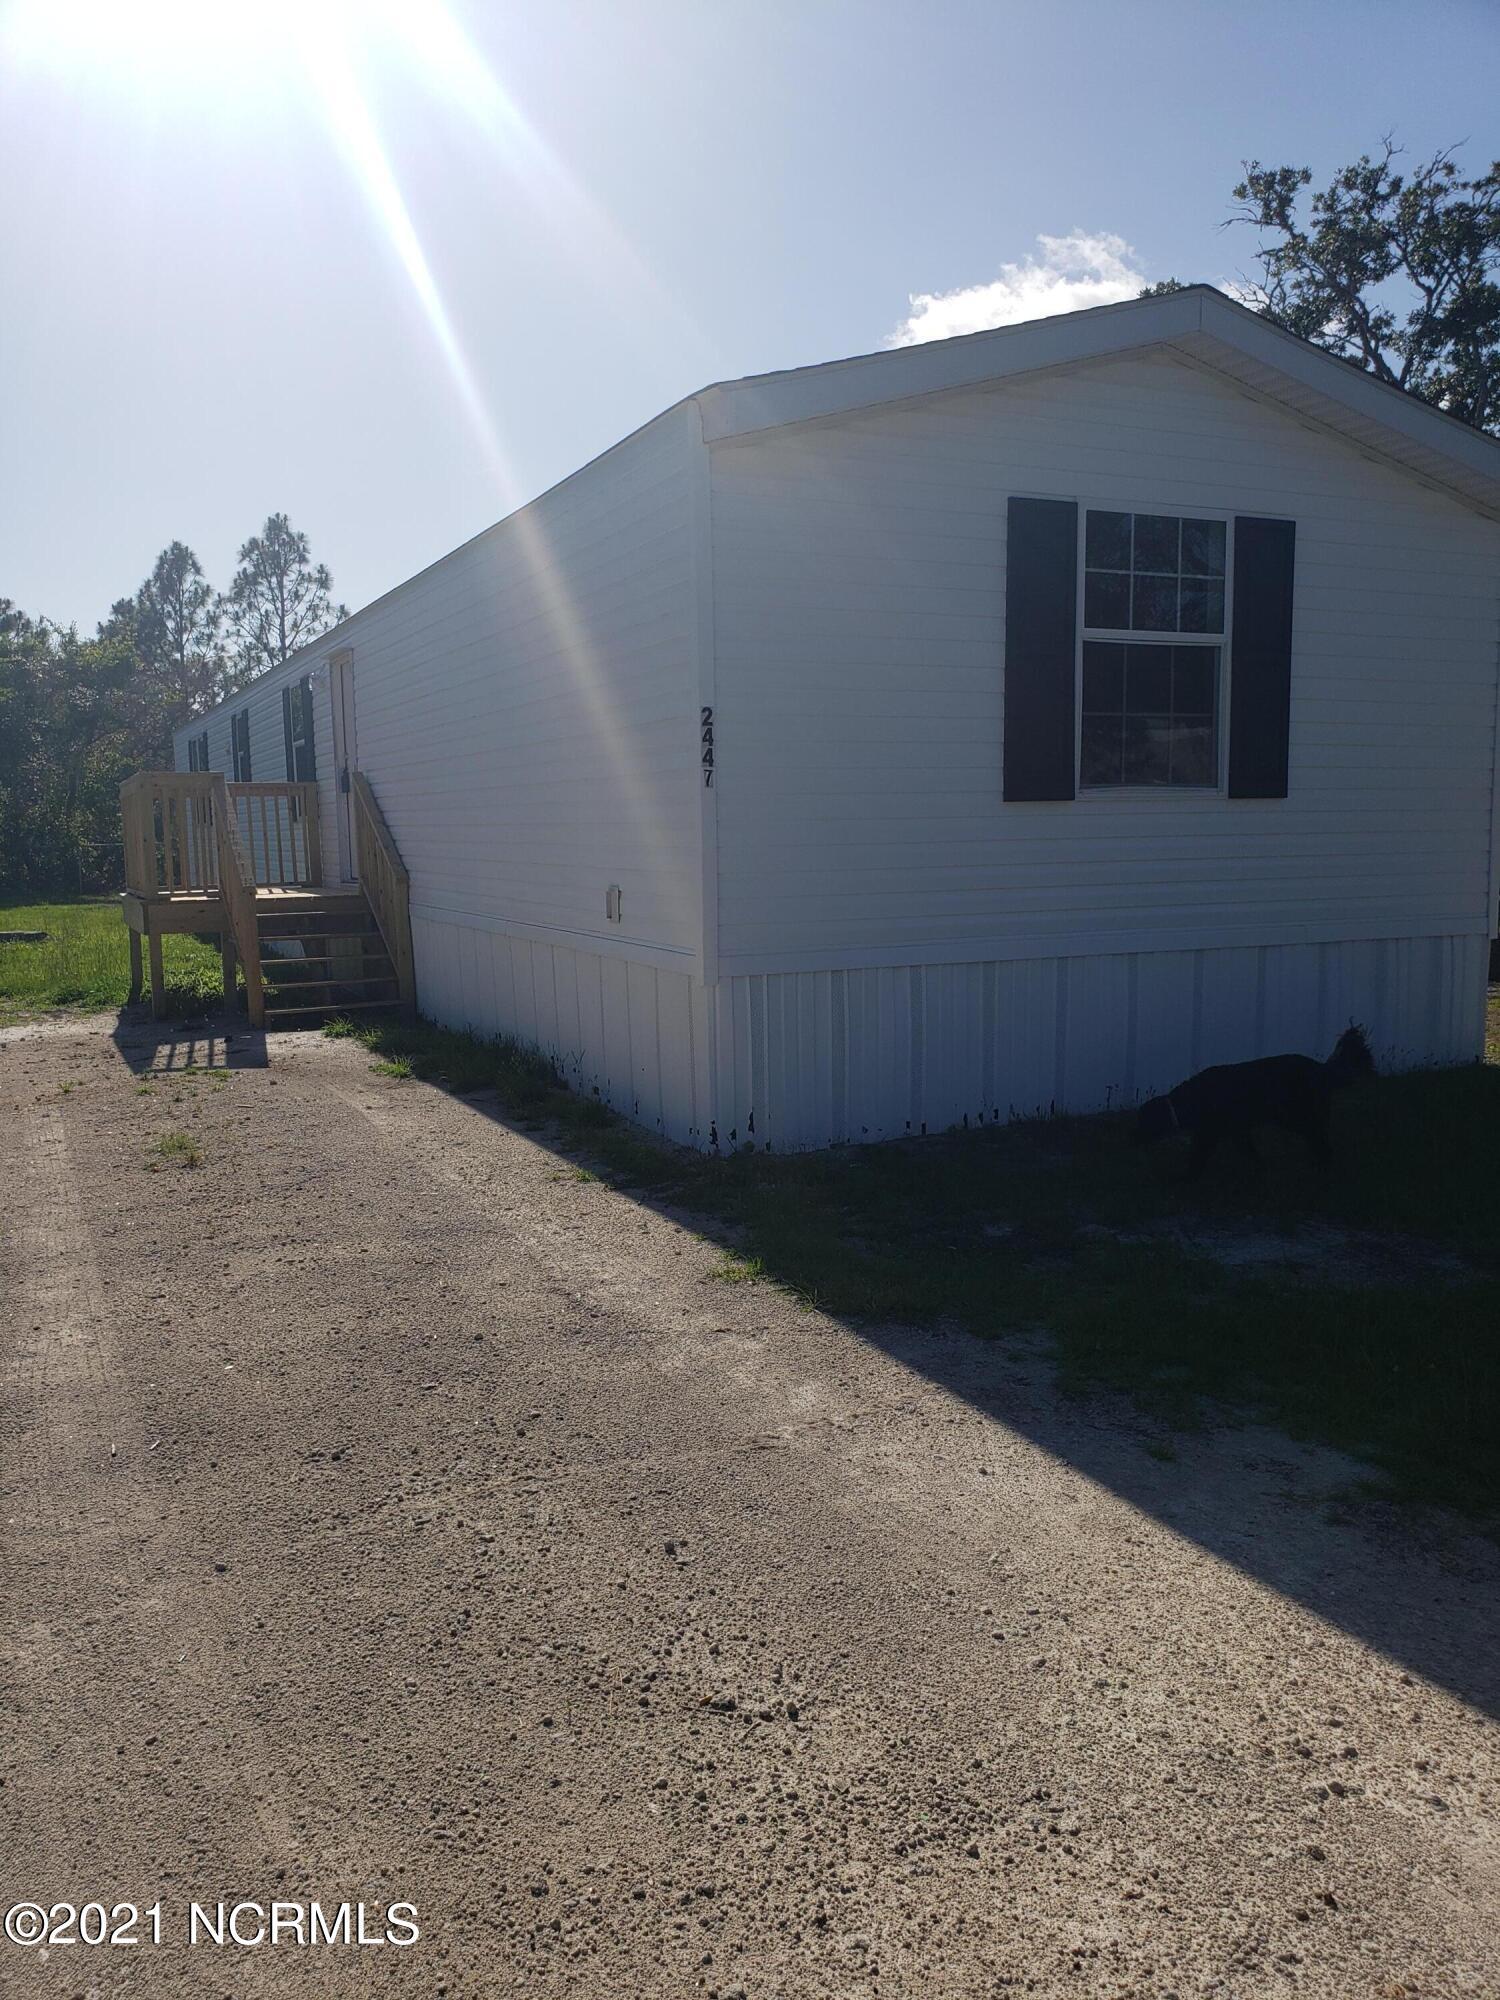 2447 Burgaw Street, Supply, North Carolina 28462, 3 Bedrooms Bedrooms, 5 Rooms Rooms,2 BathroomsBathrooms,Manufactured home,For sale,Burgaw,100275289